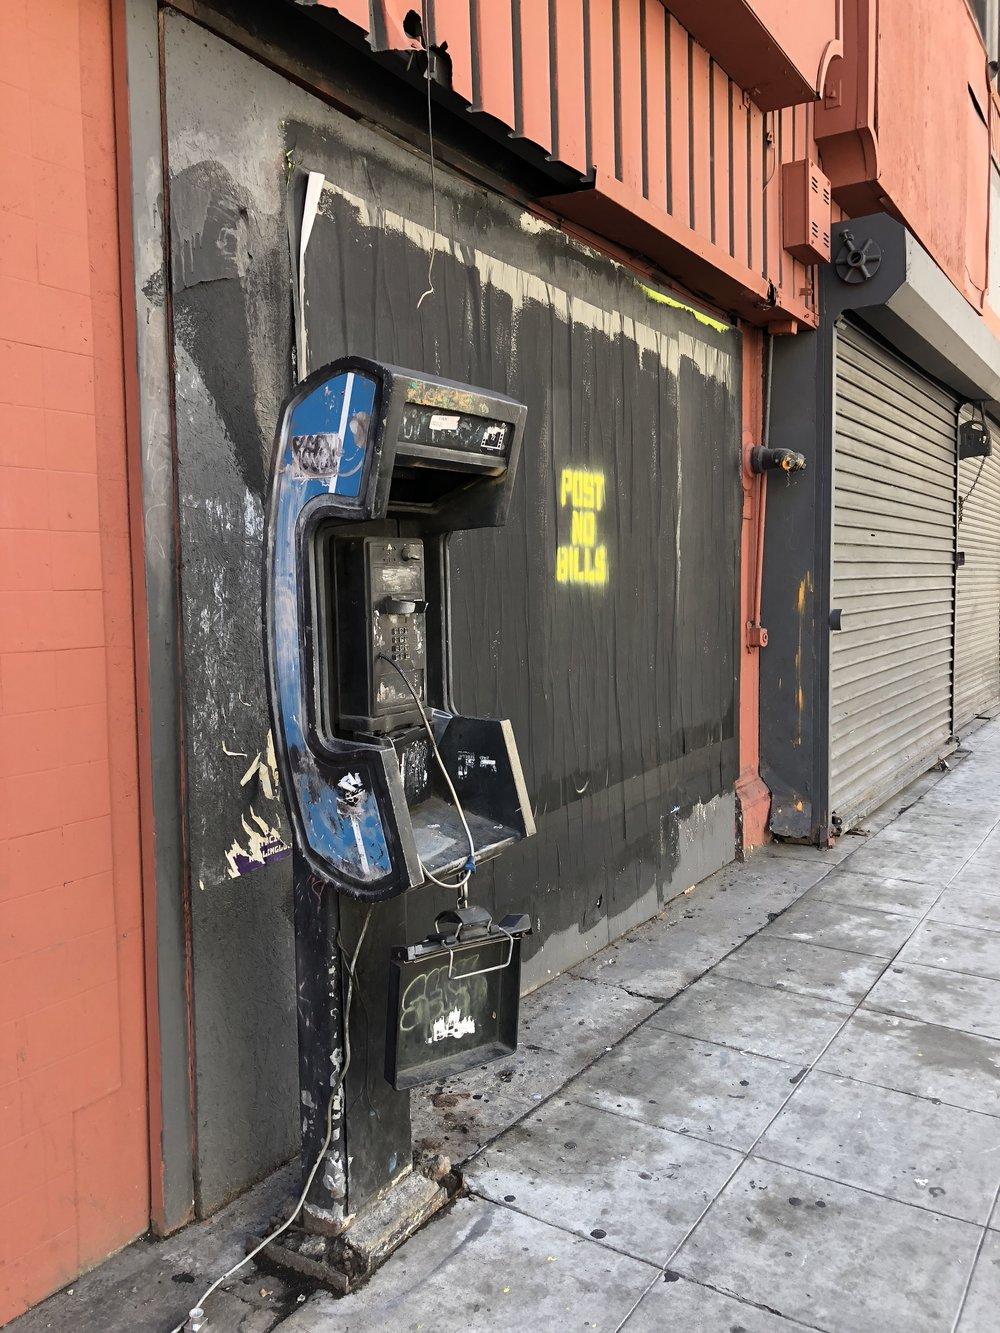 Let's talk. -Downtown LA - Shot on iPhone - March 2018